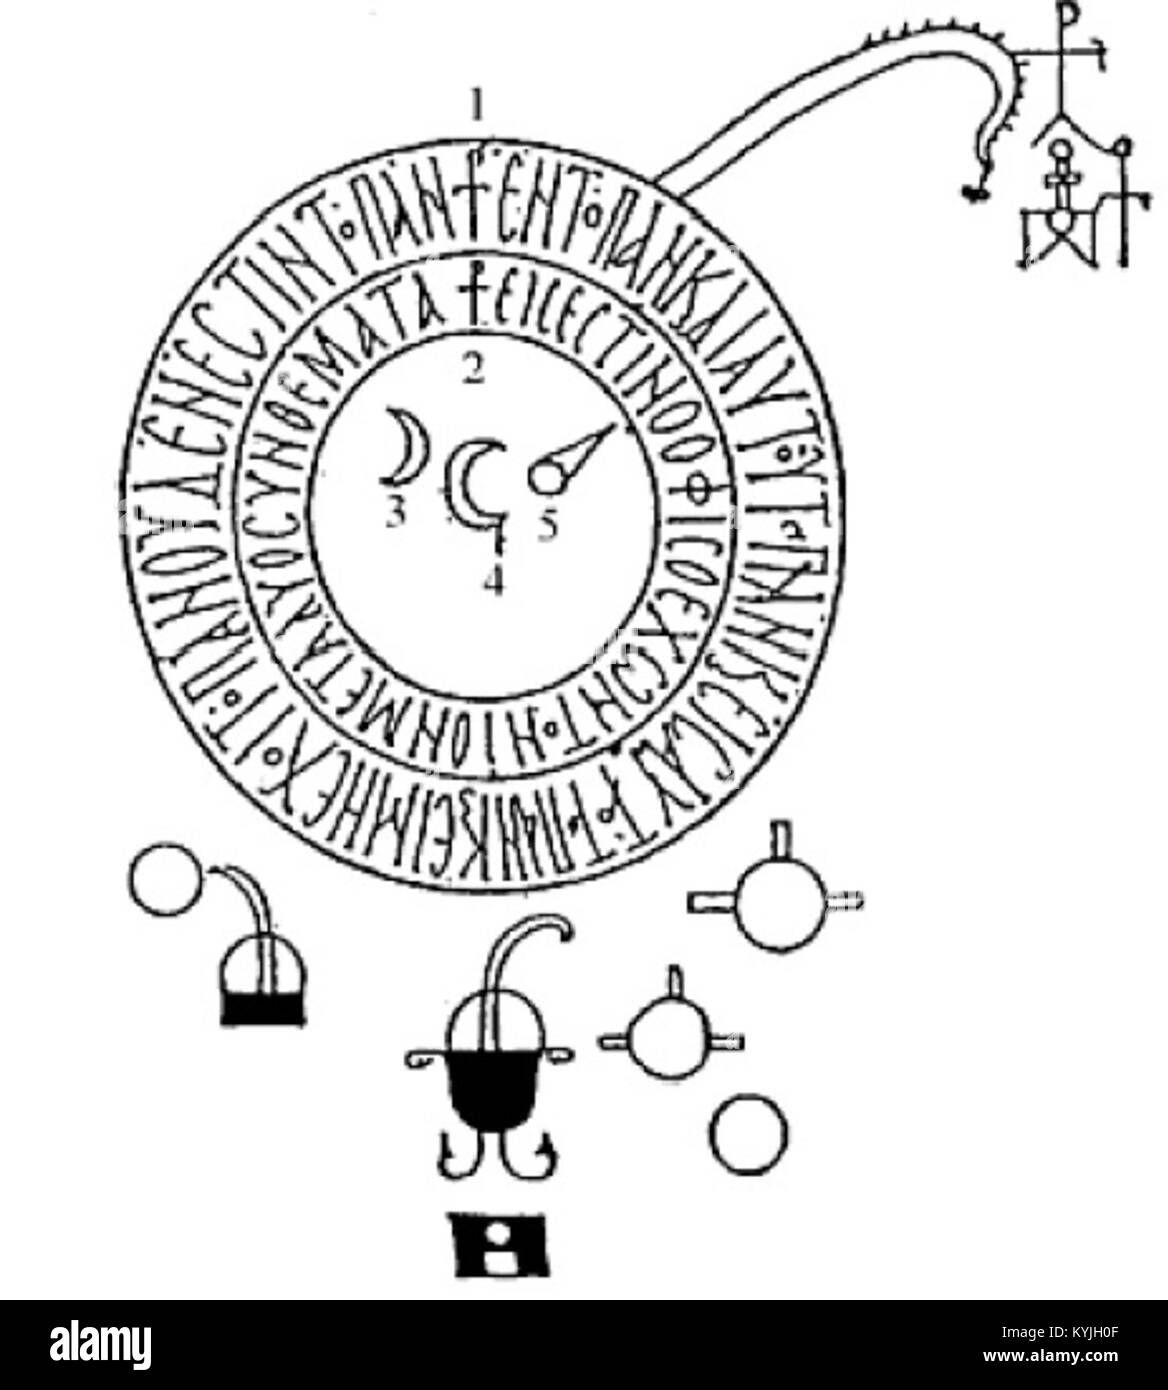 Stylised figure from Kleopatra's alchemical Chrysopoeia - Stock Image